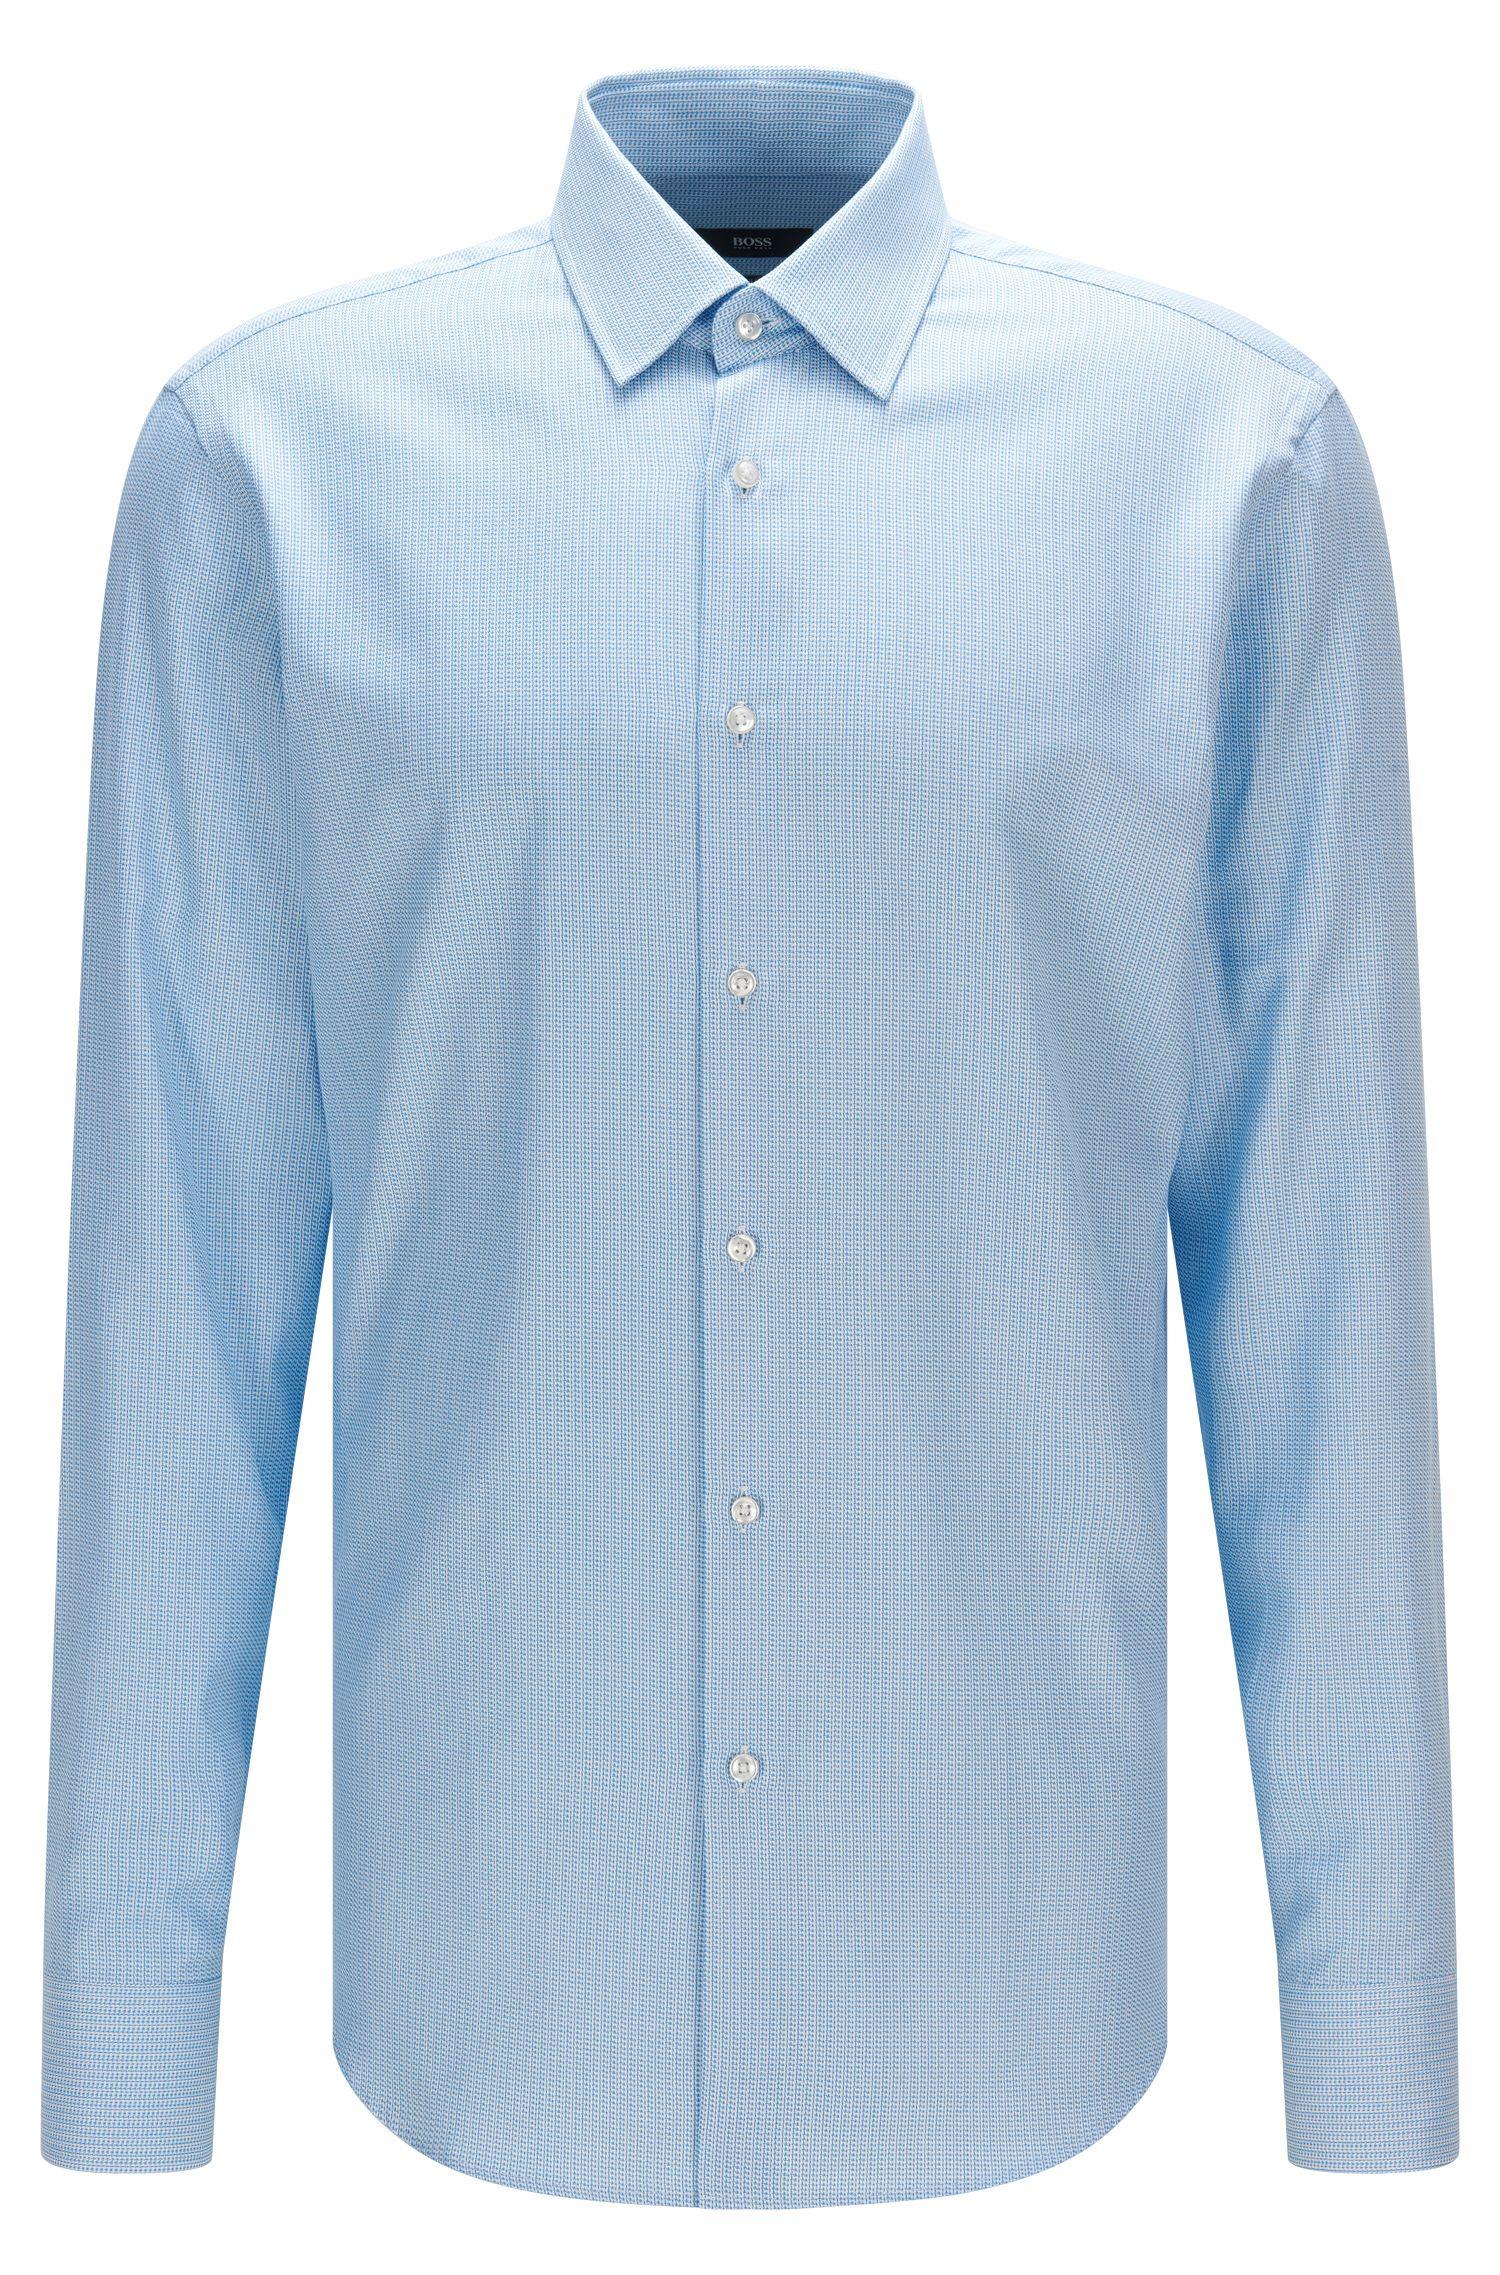 Camisa regular fit de algodón con microtextura